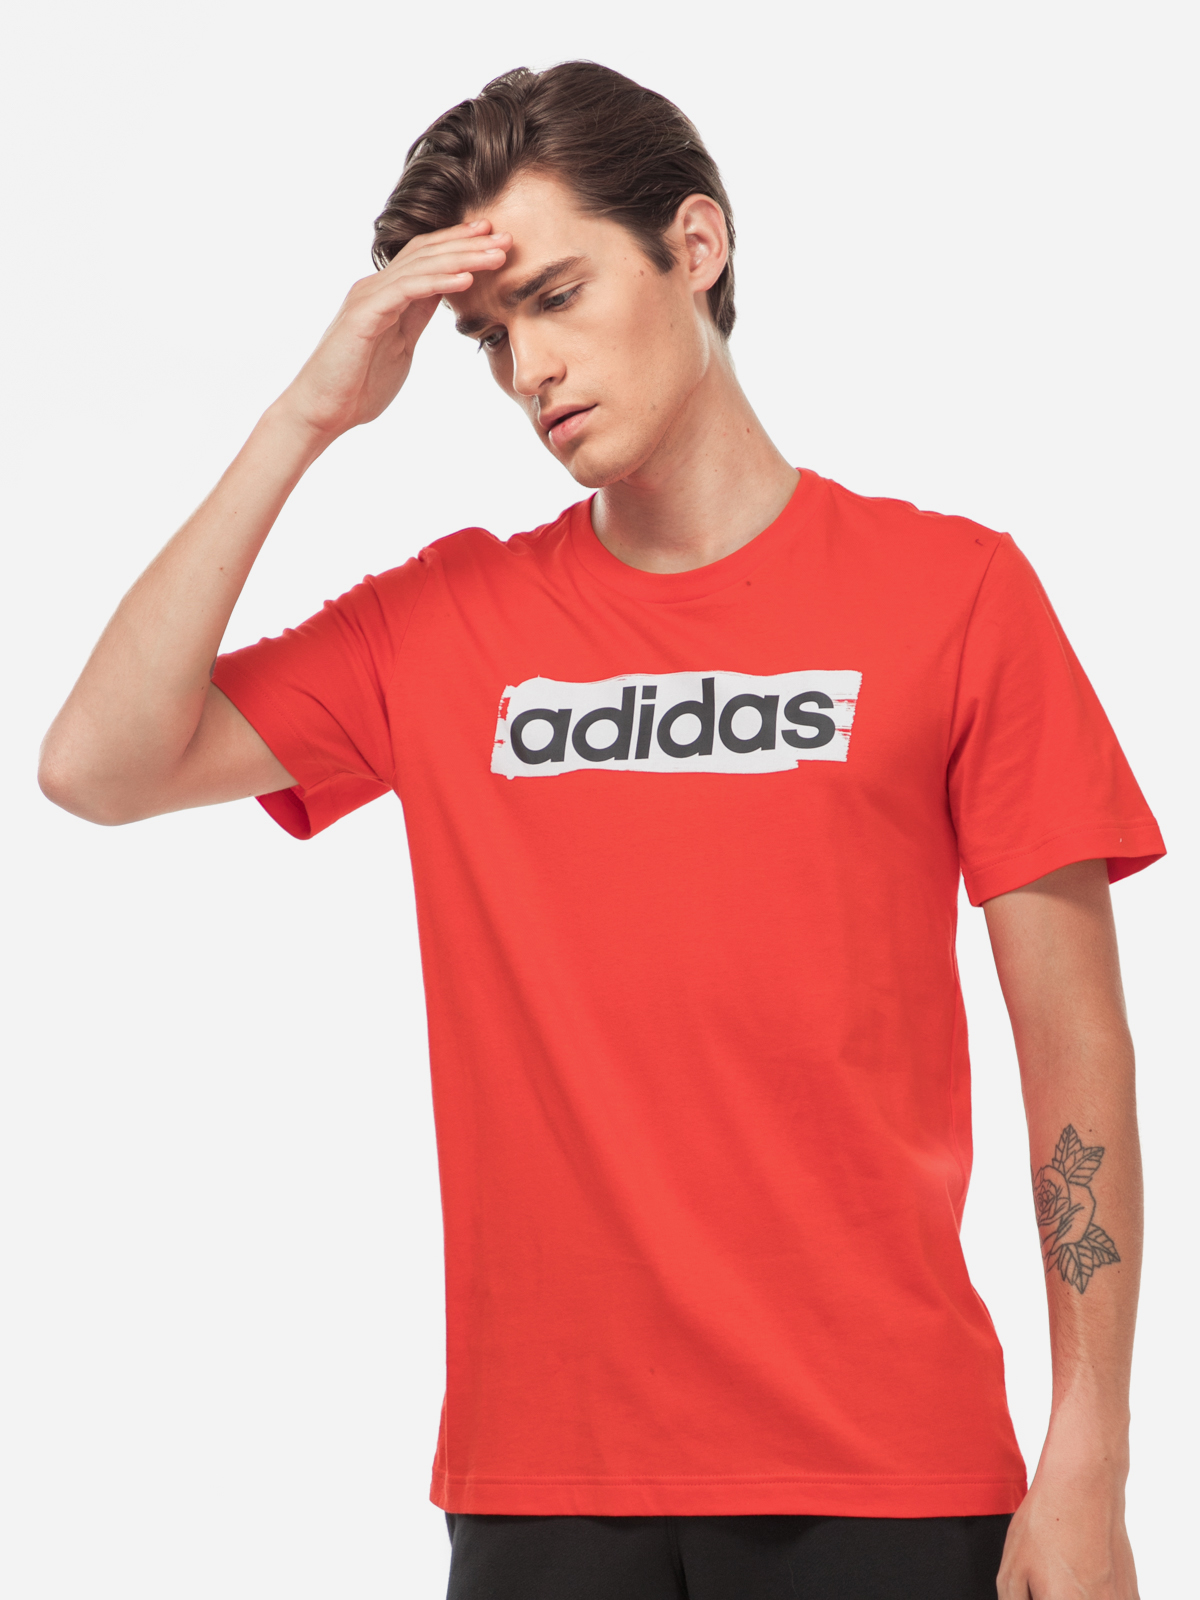 costume Australia Animali  мужская футболка adidas originals   Newmood